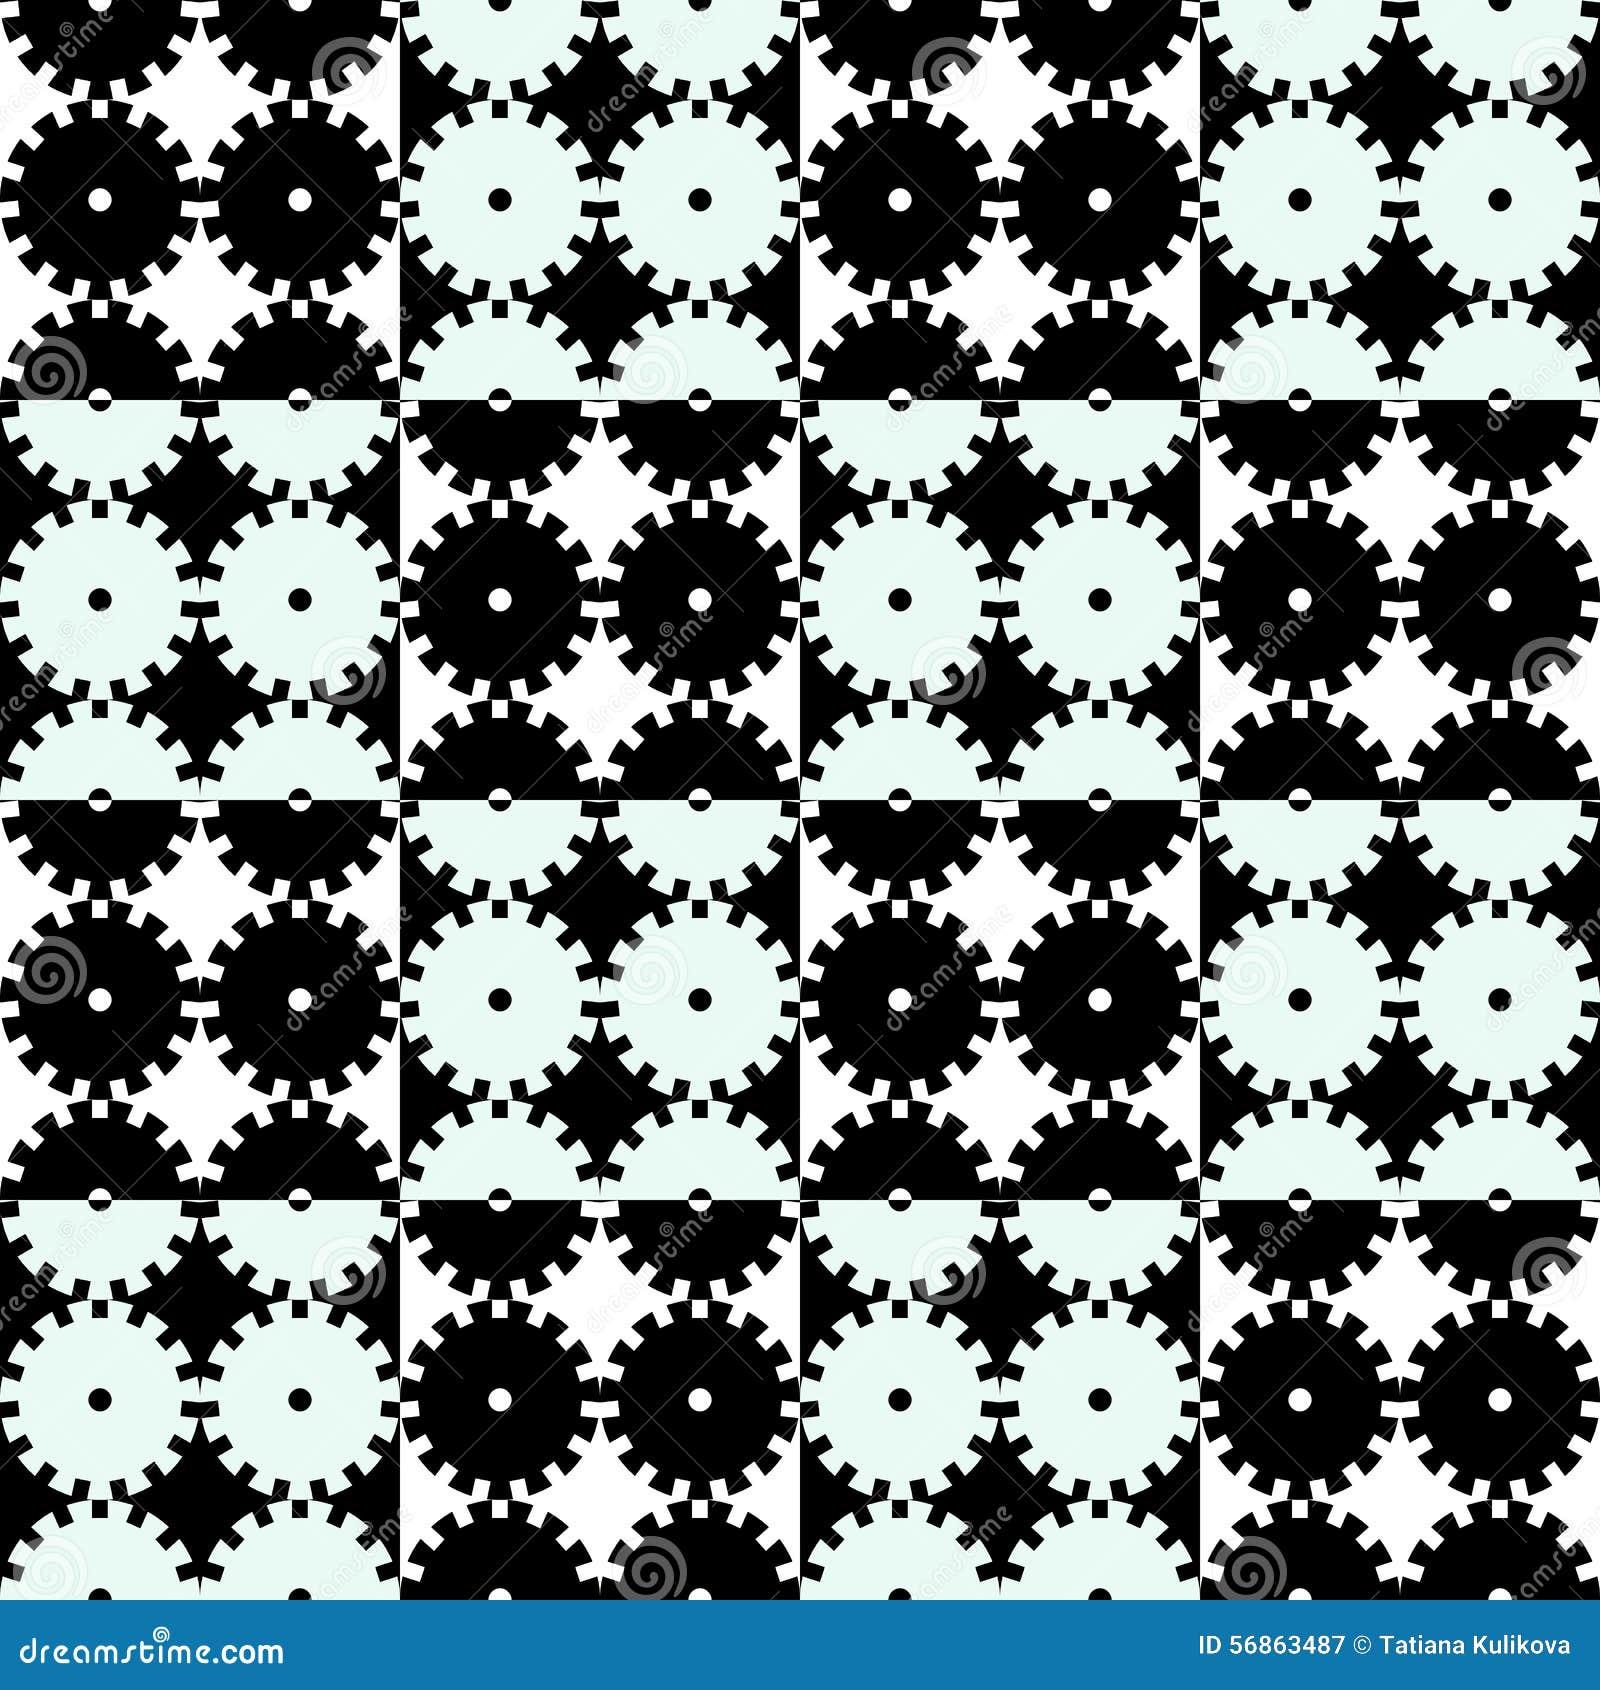 Seamless mechanics black and white background